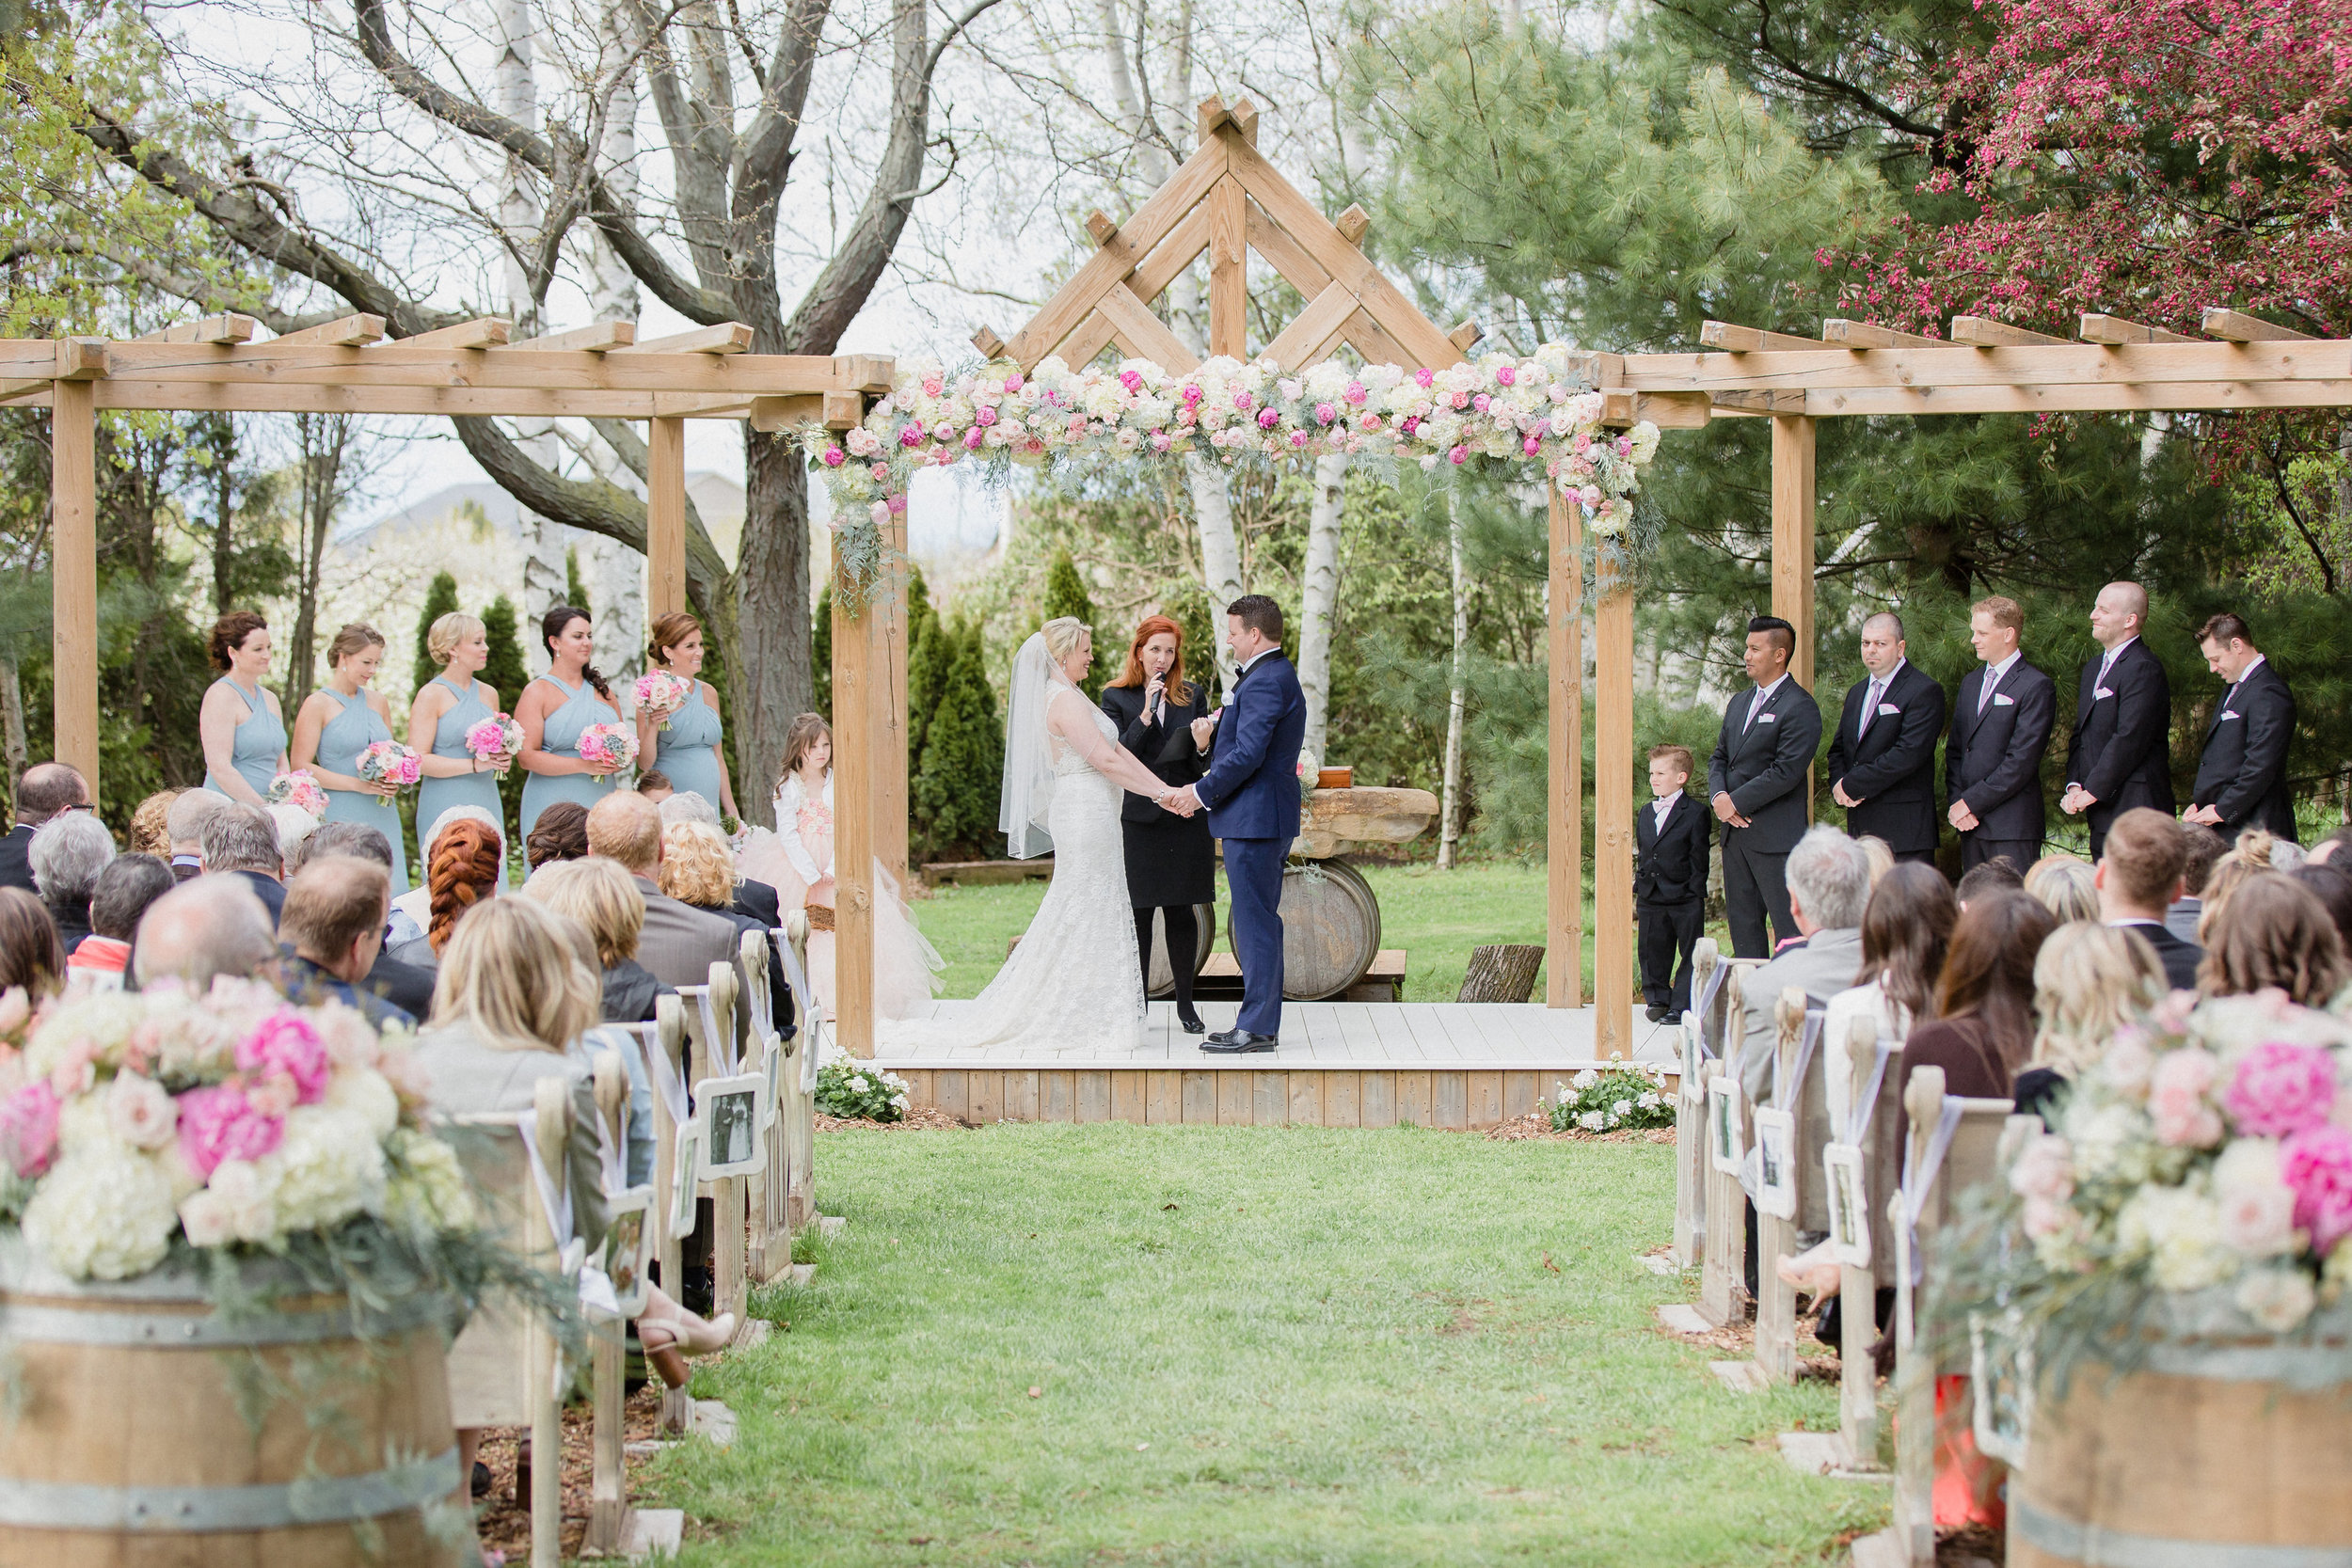 AllisonJonathan-3Ceremony-119a_divine_affair_niagara_wedding_planner.jpg